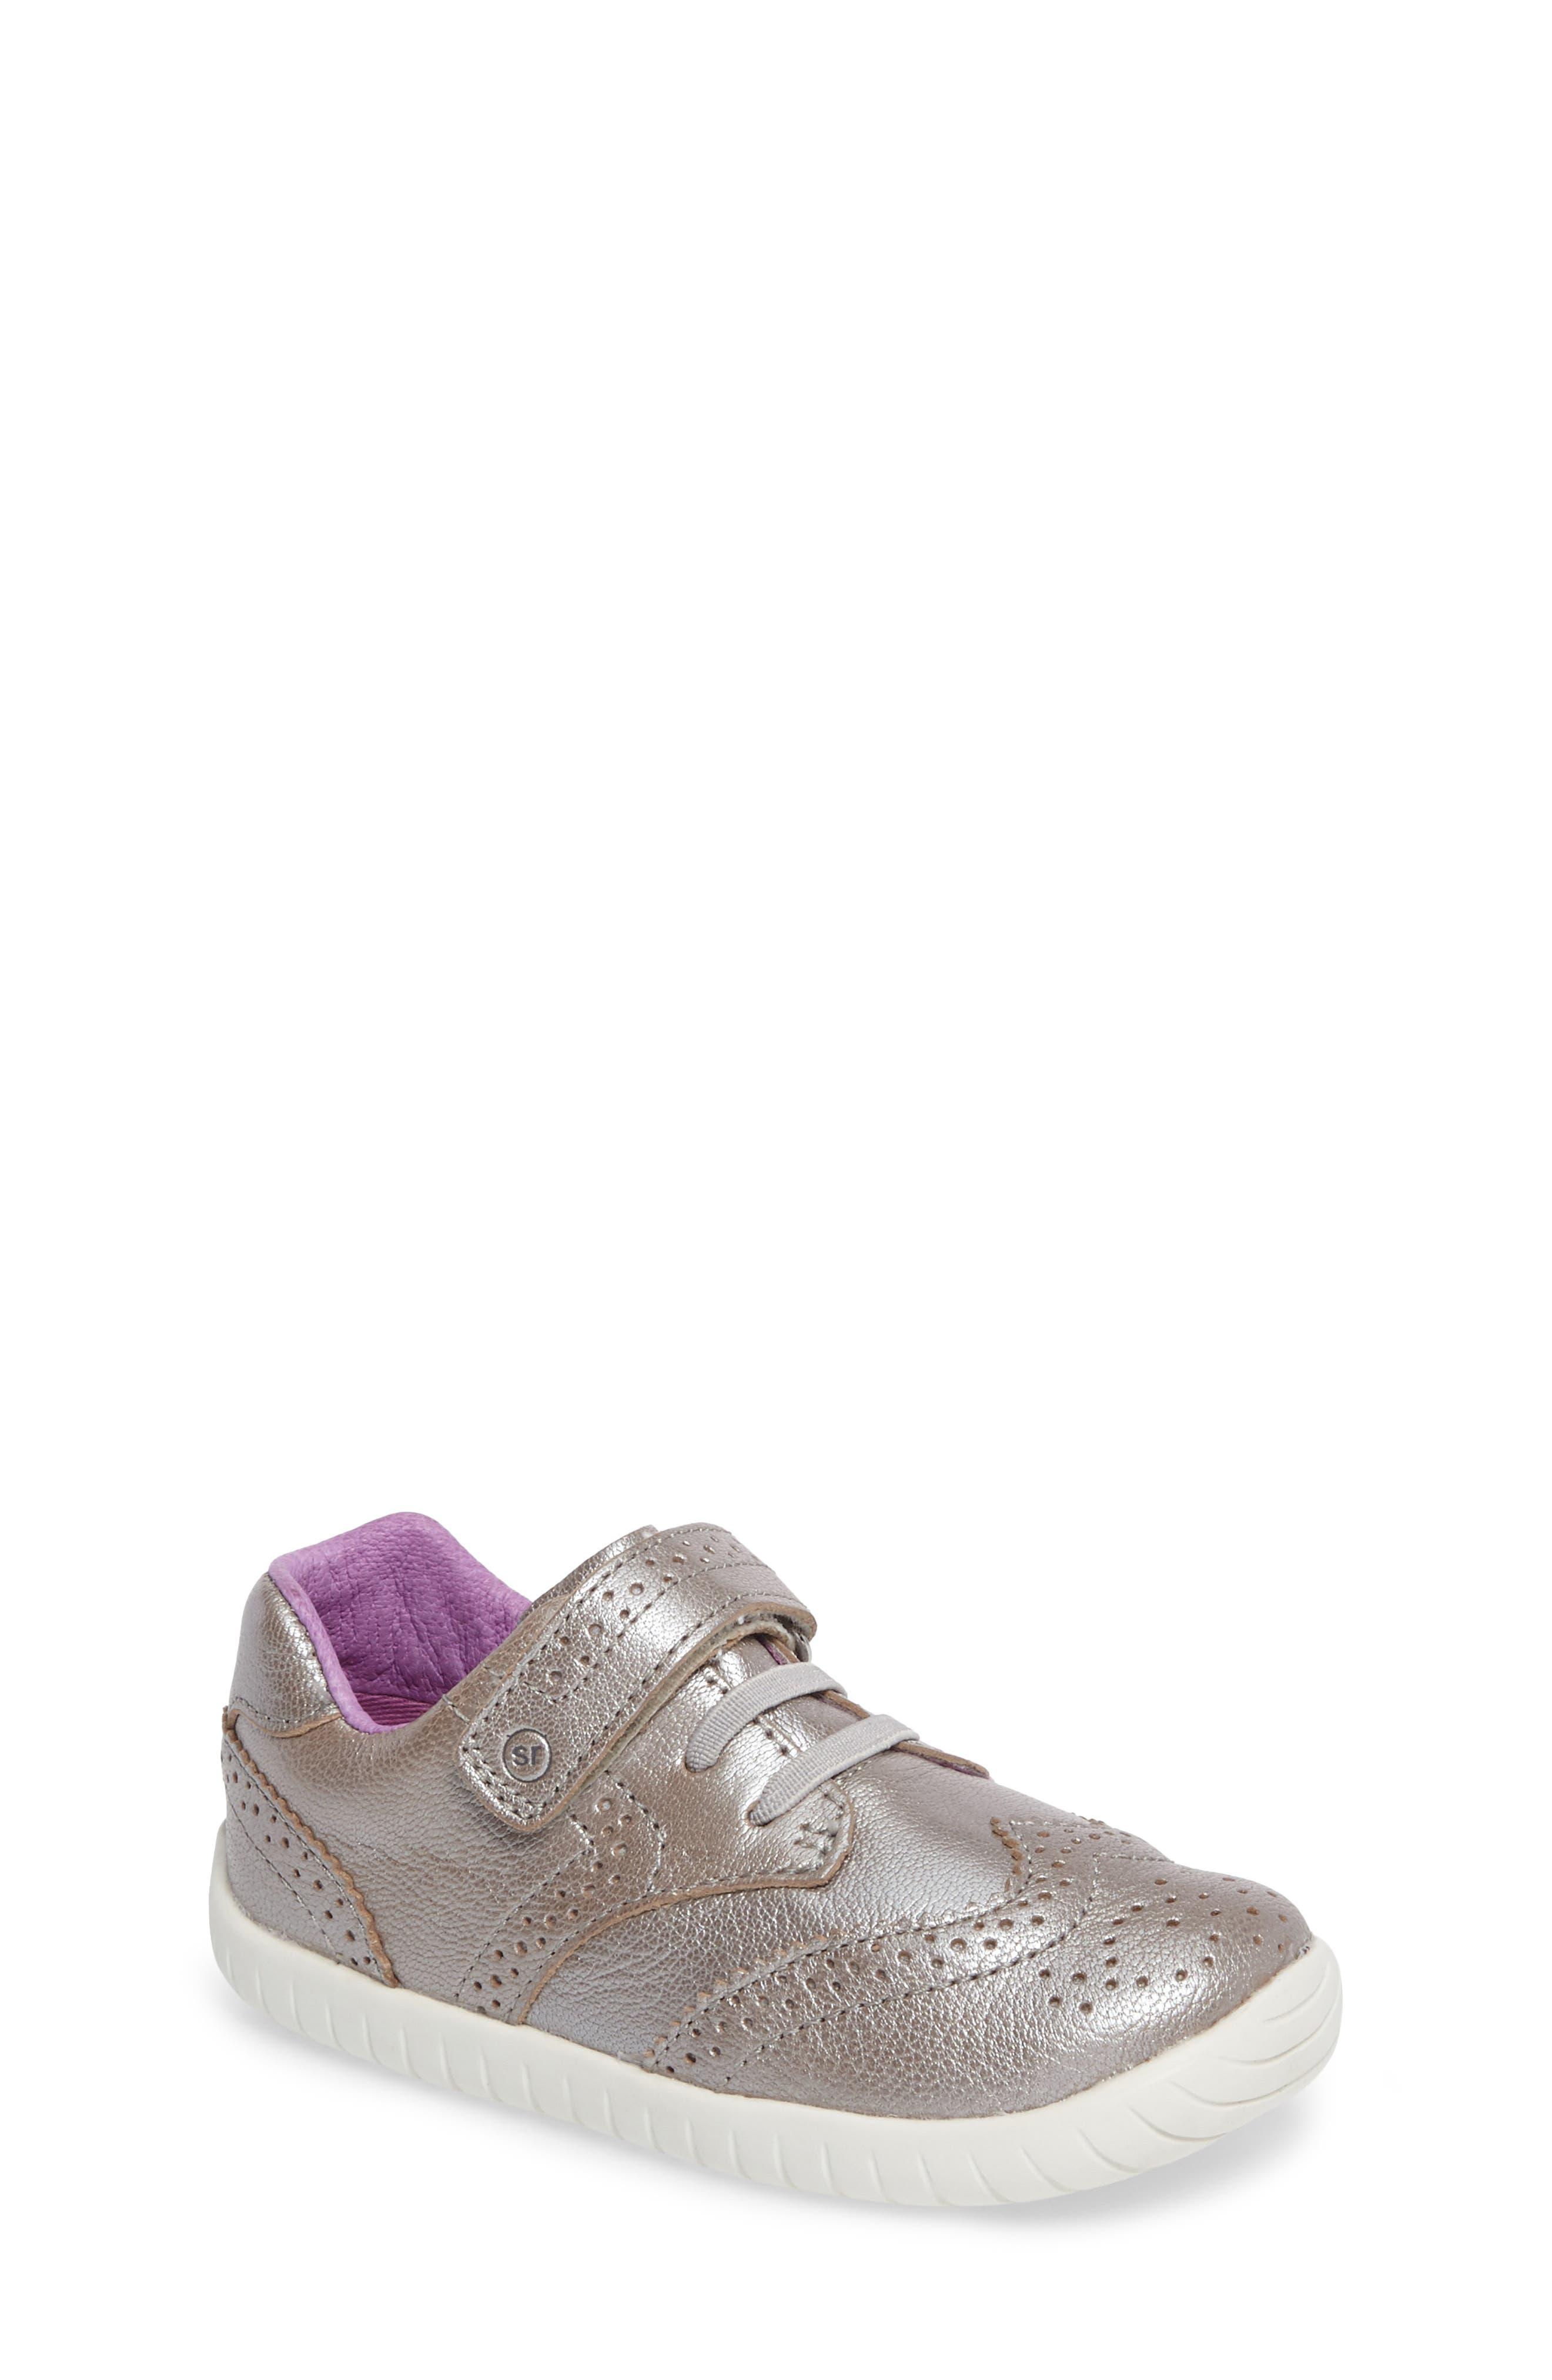 Addison Metallic Wingtip Sneaker,                             Main thumbnail 1, color,                             040